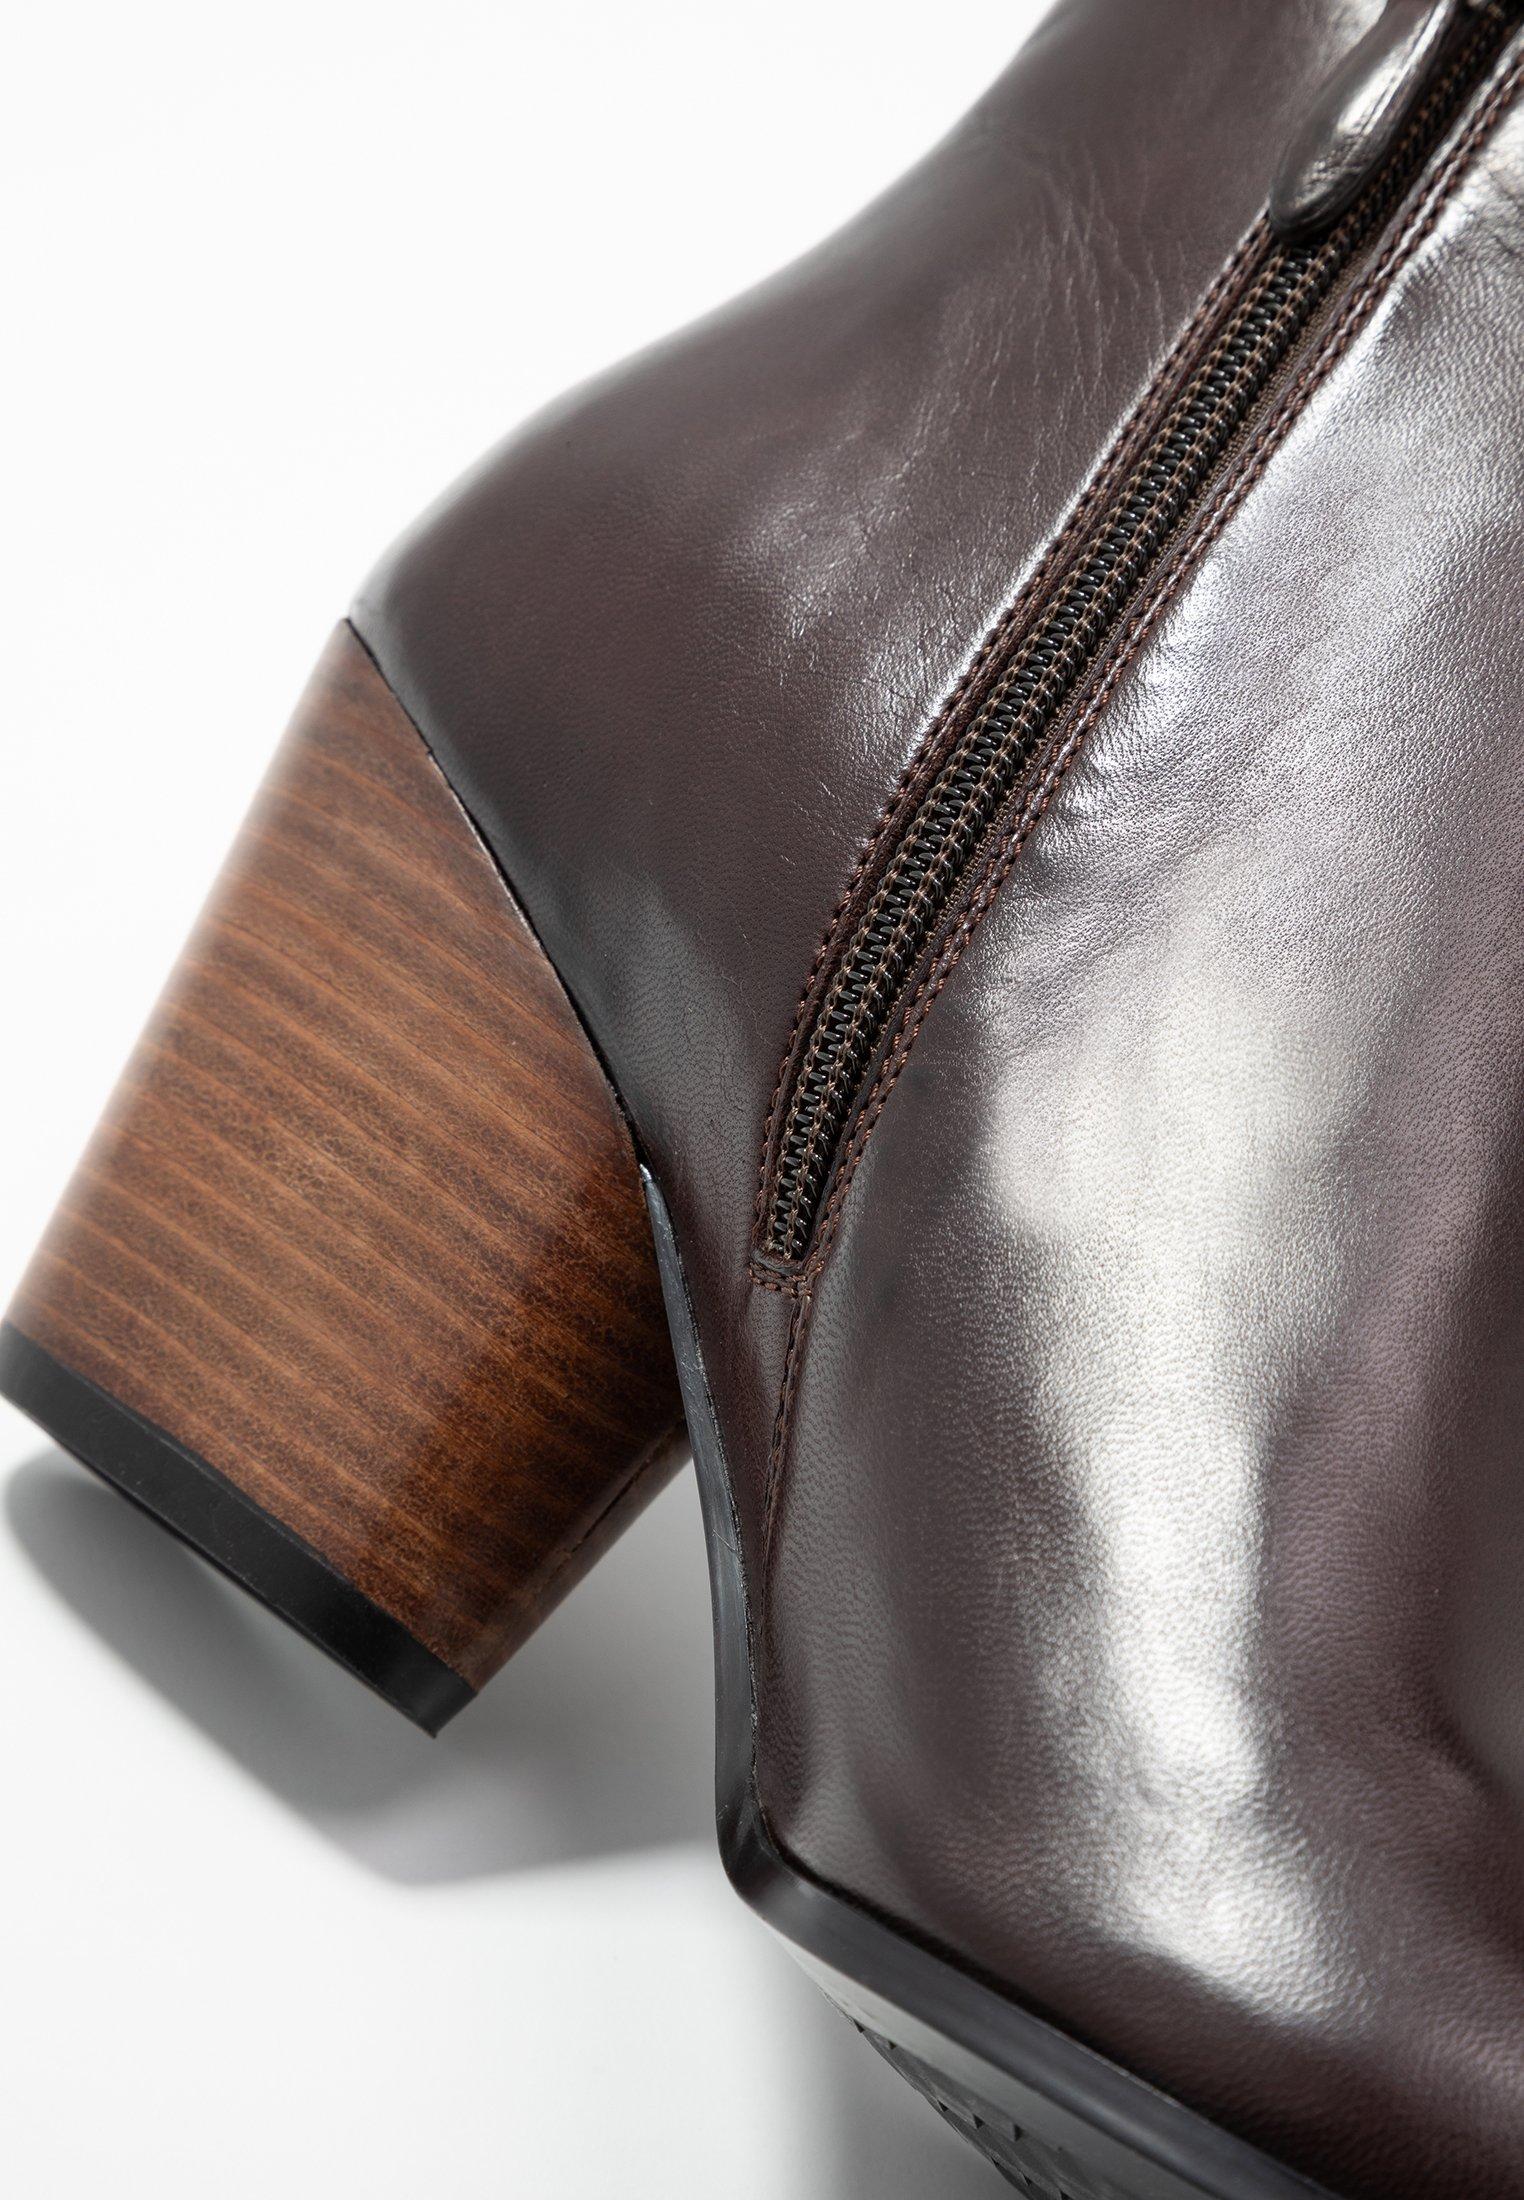 2020 New Perfect Women's Shoes Bruno Premi Classic ankle boots teak KfZZq1HBA ET7o4Gics